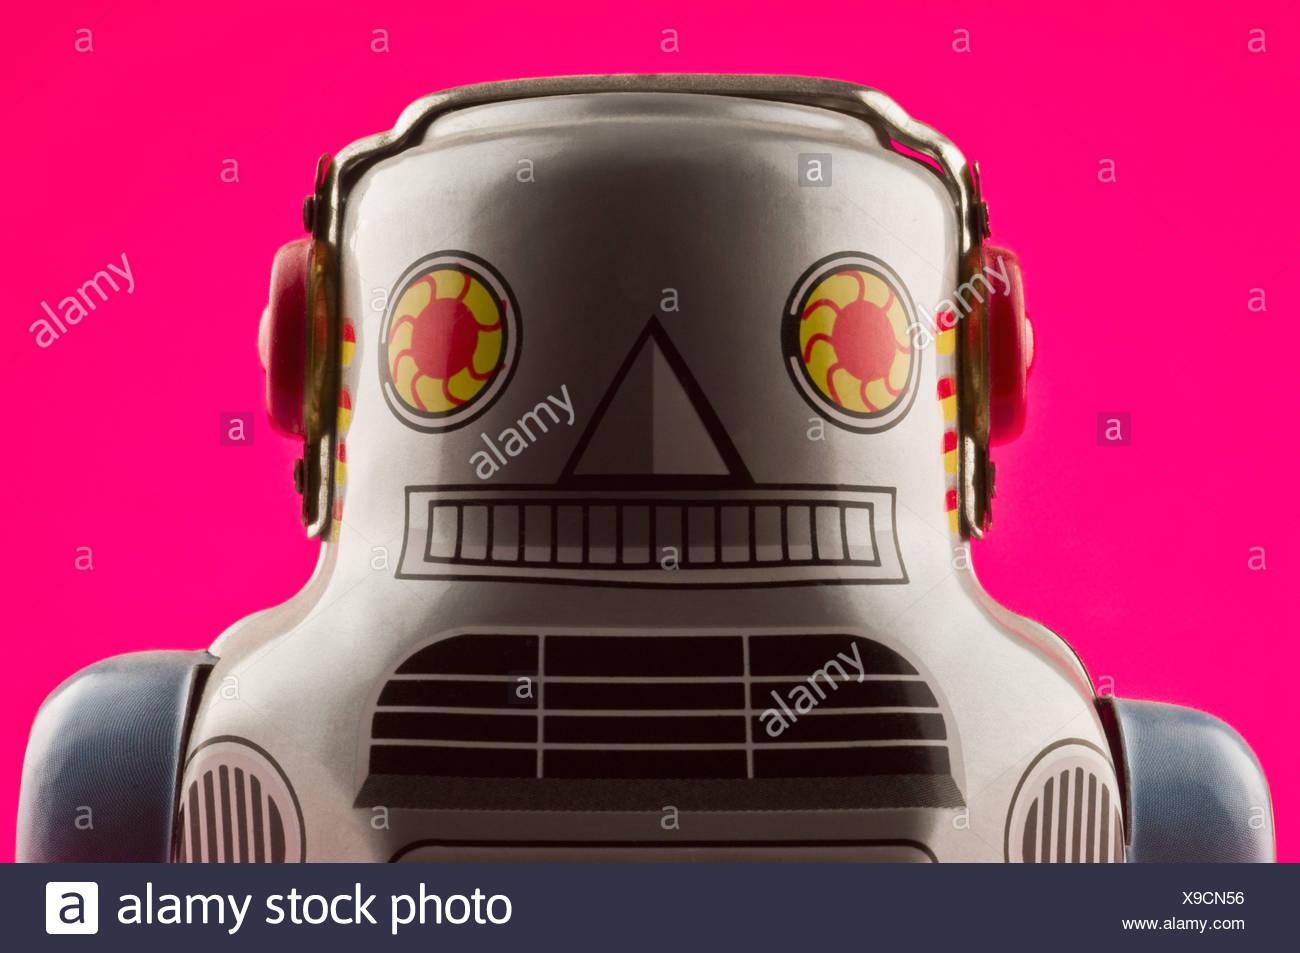 Robô de brinquedo Imagens de Stock